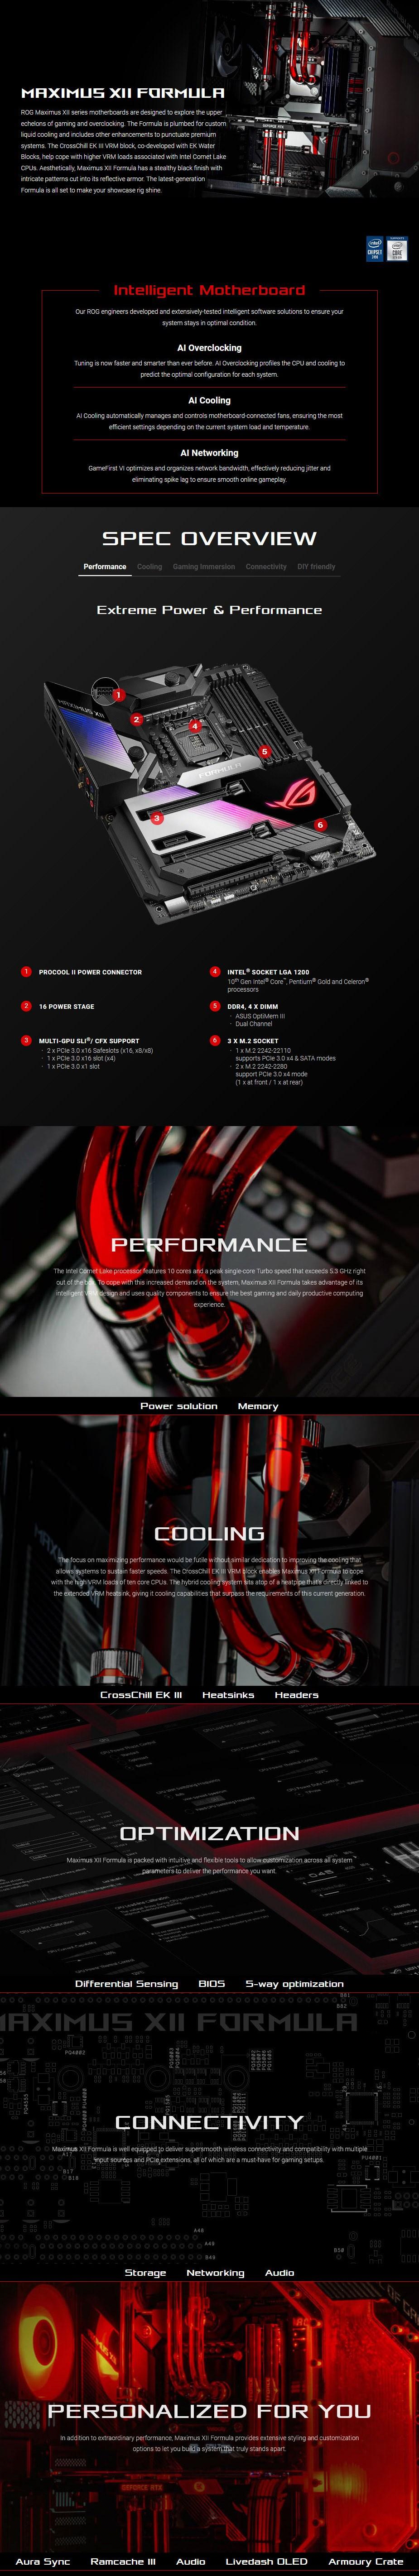 ASUS ROG Z490 MAXIMUS XII FORMULA LGA 1200 ATX Motherboard - Overview 1